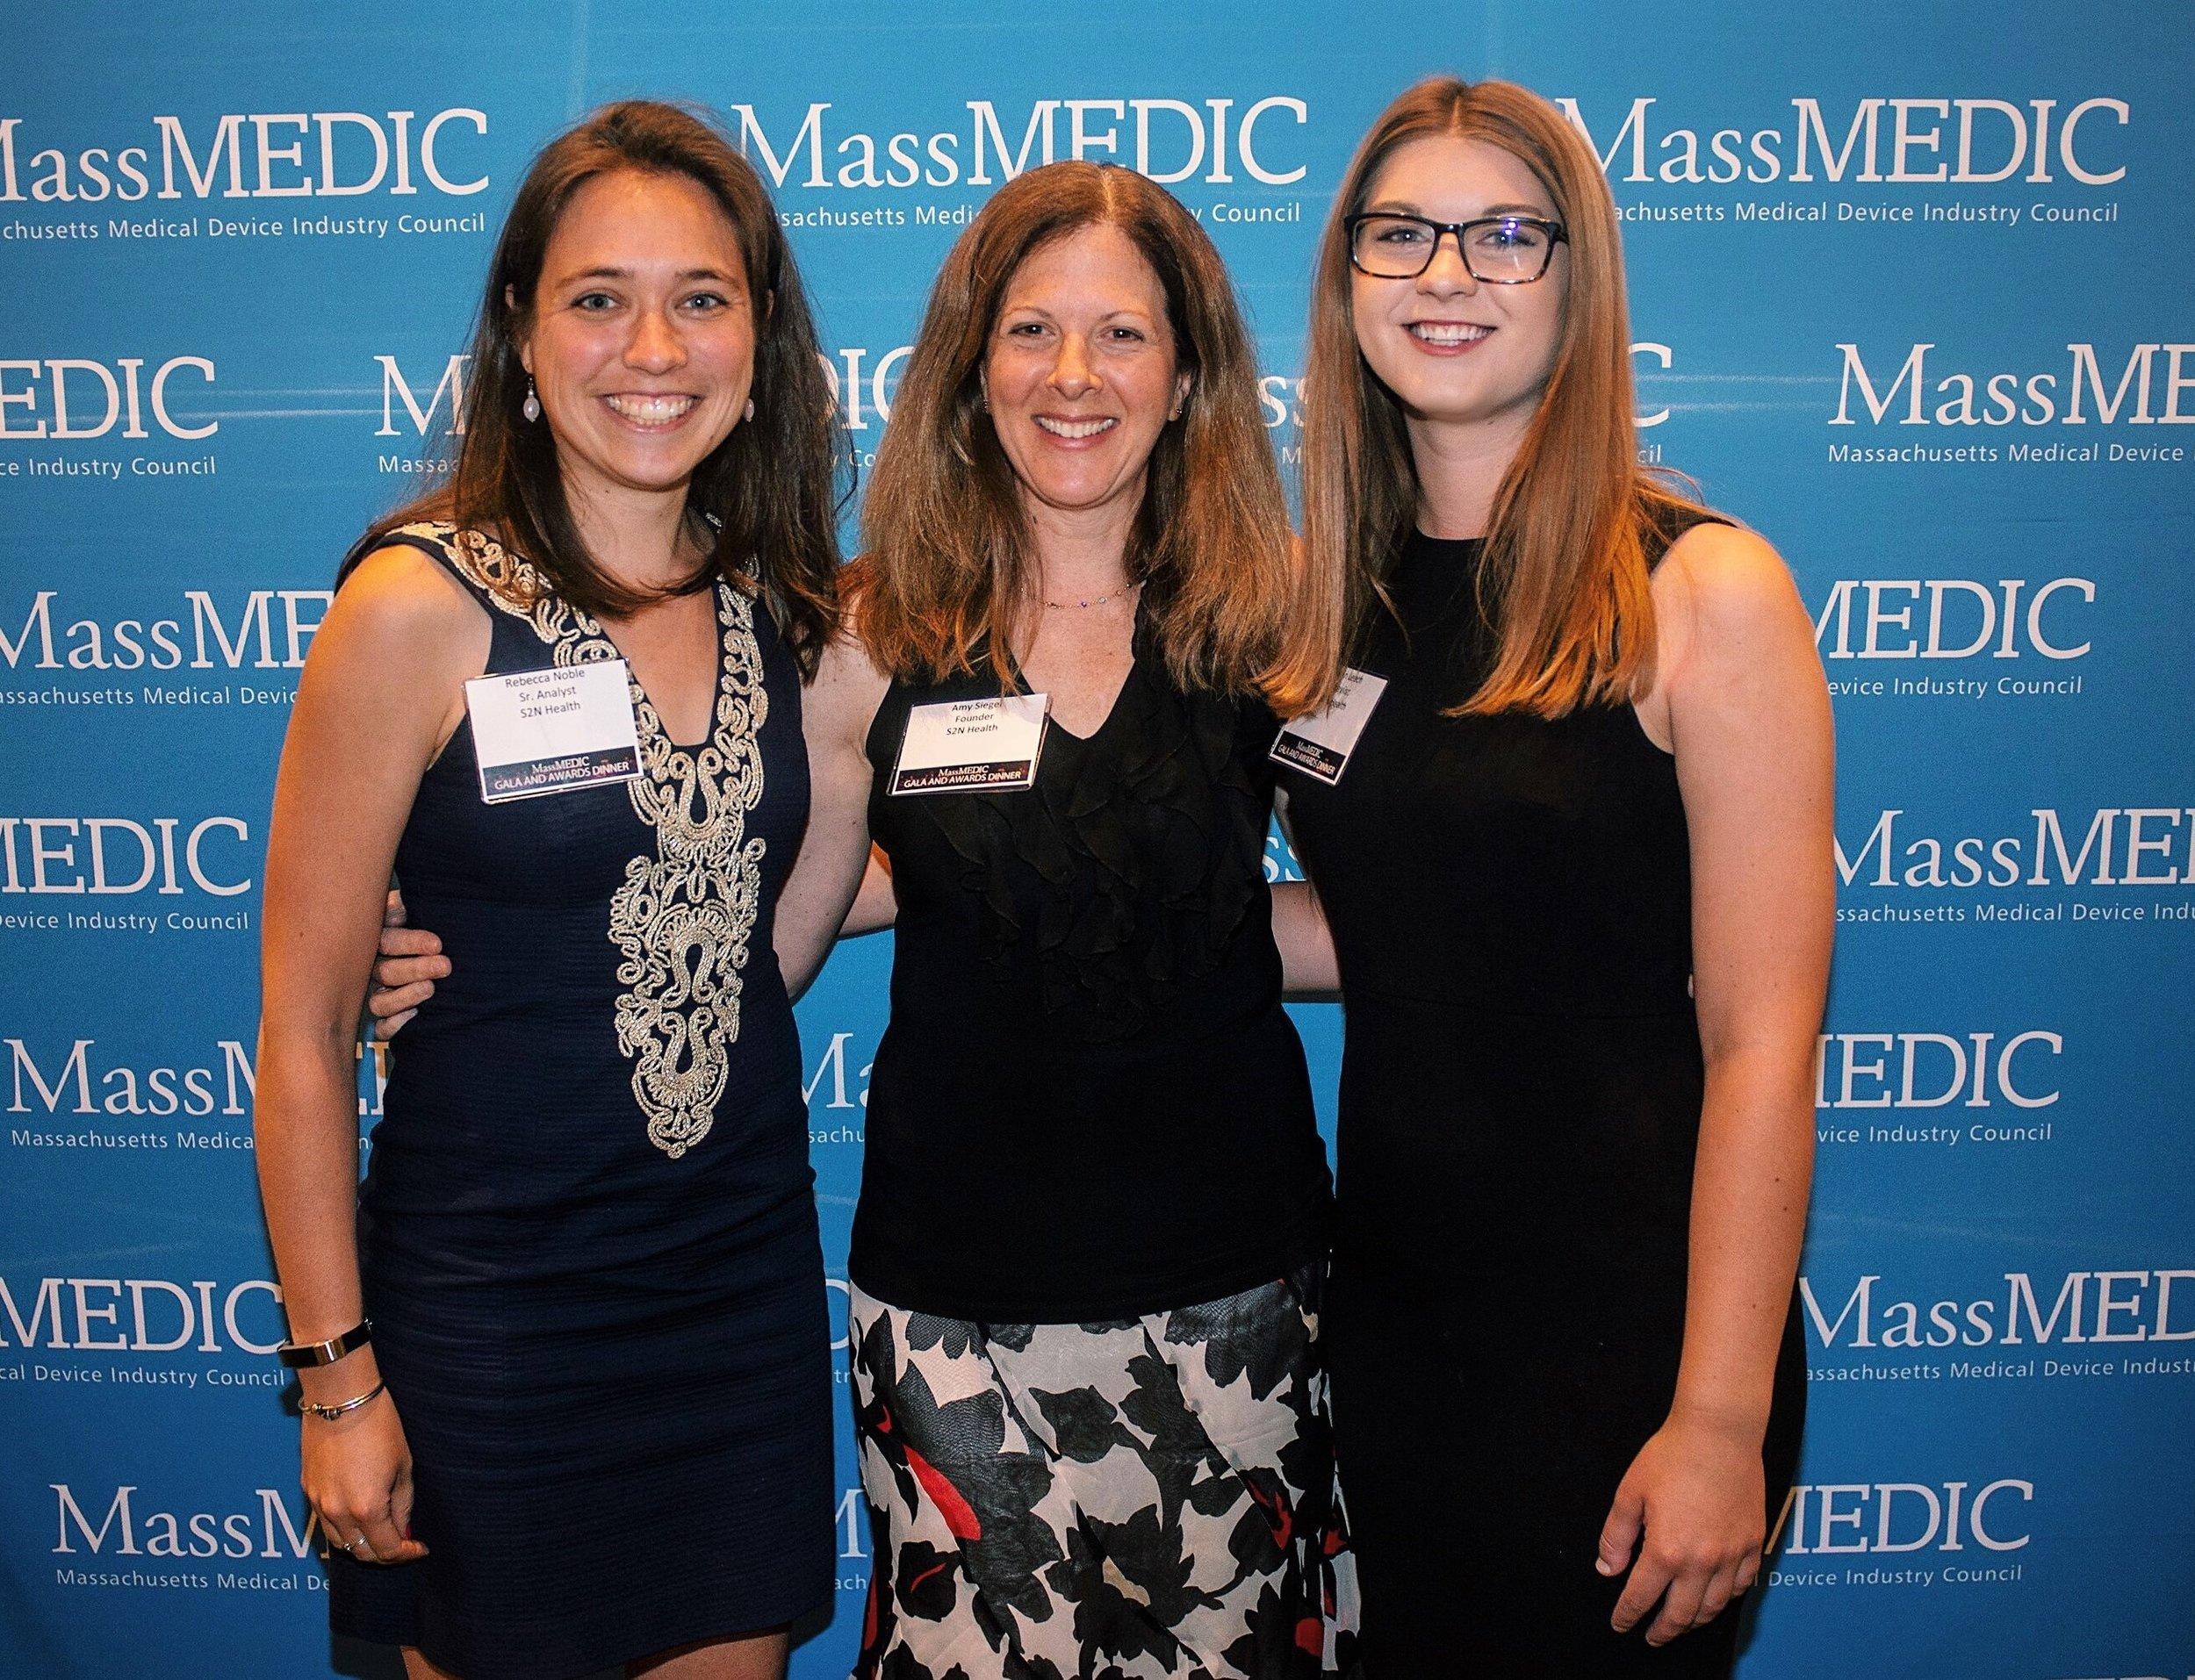 Rebecca, Amy, and Kristen enjoying the MassMedic Gala